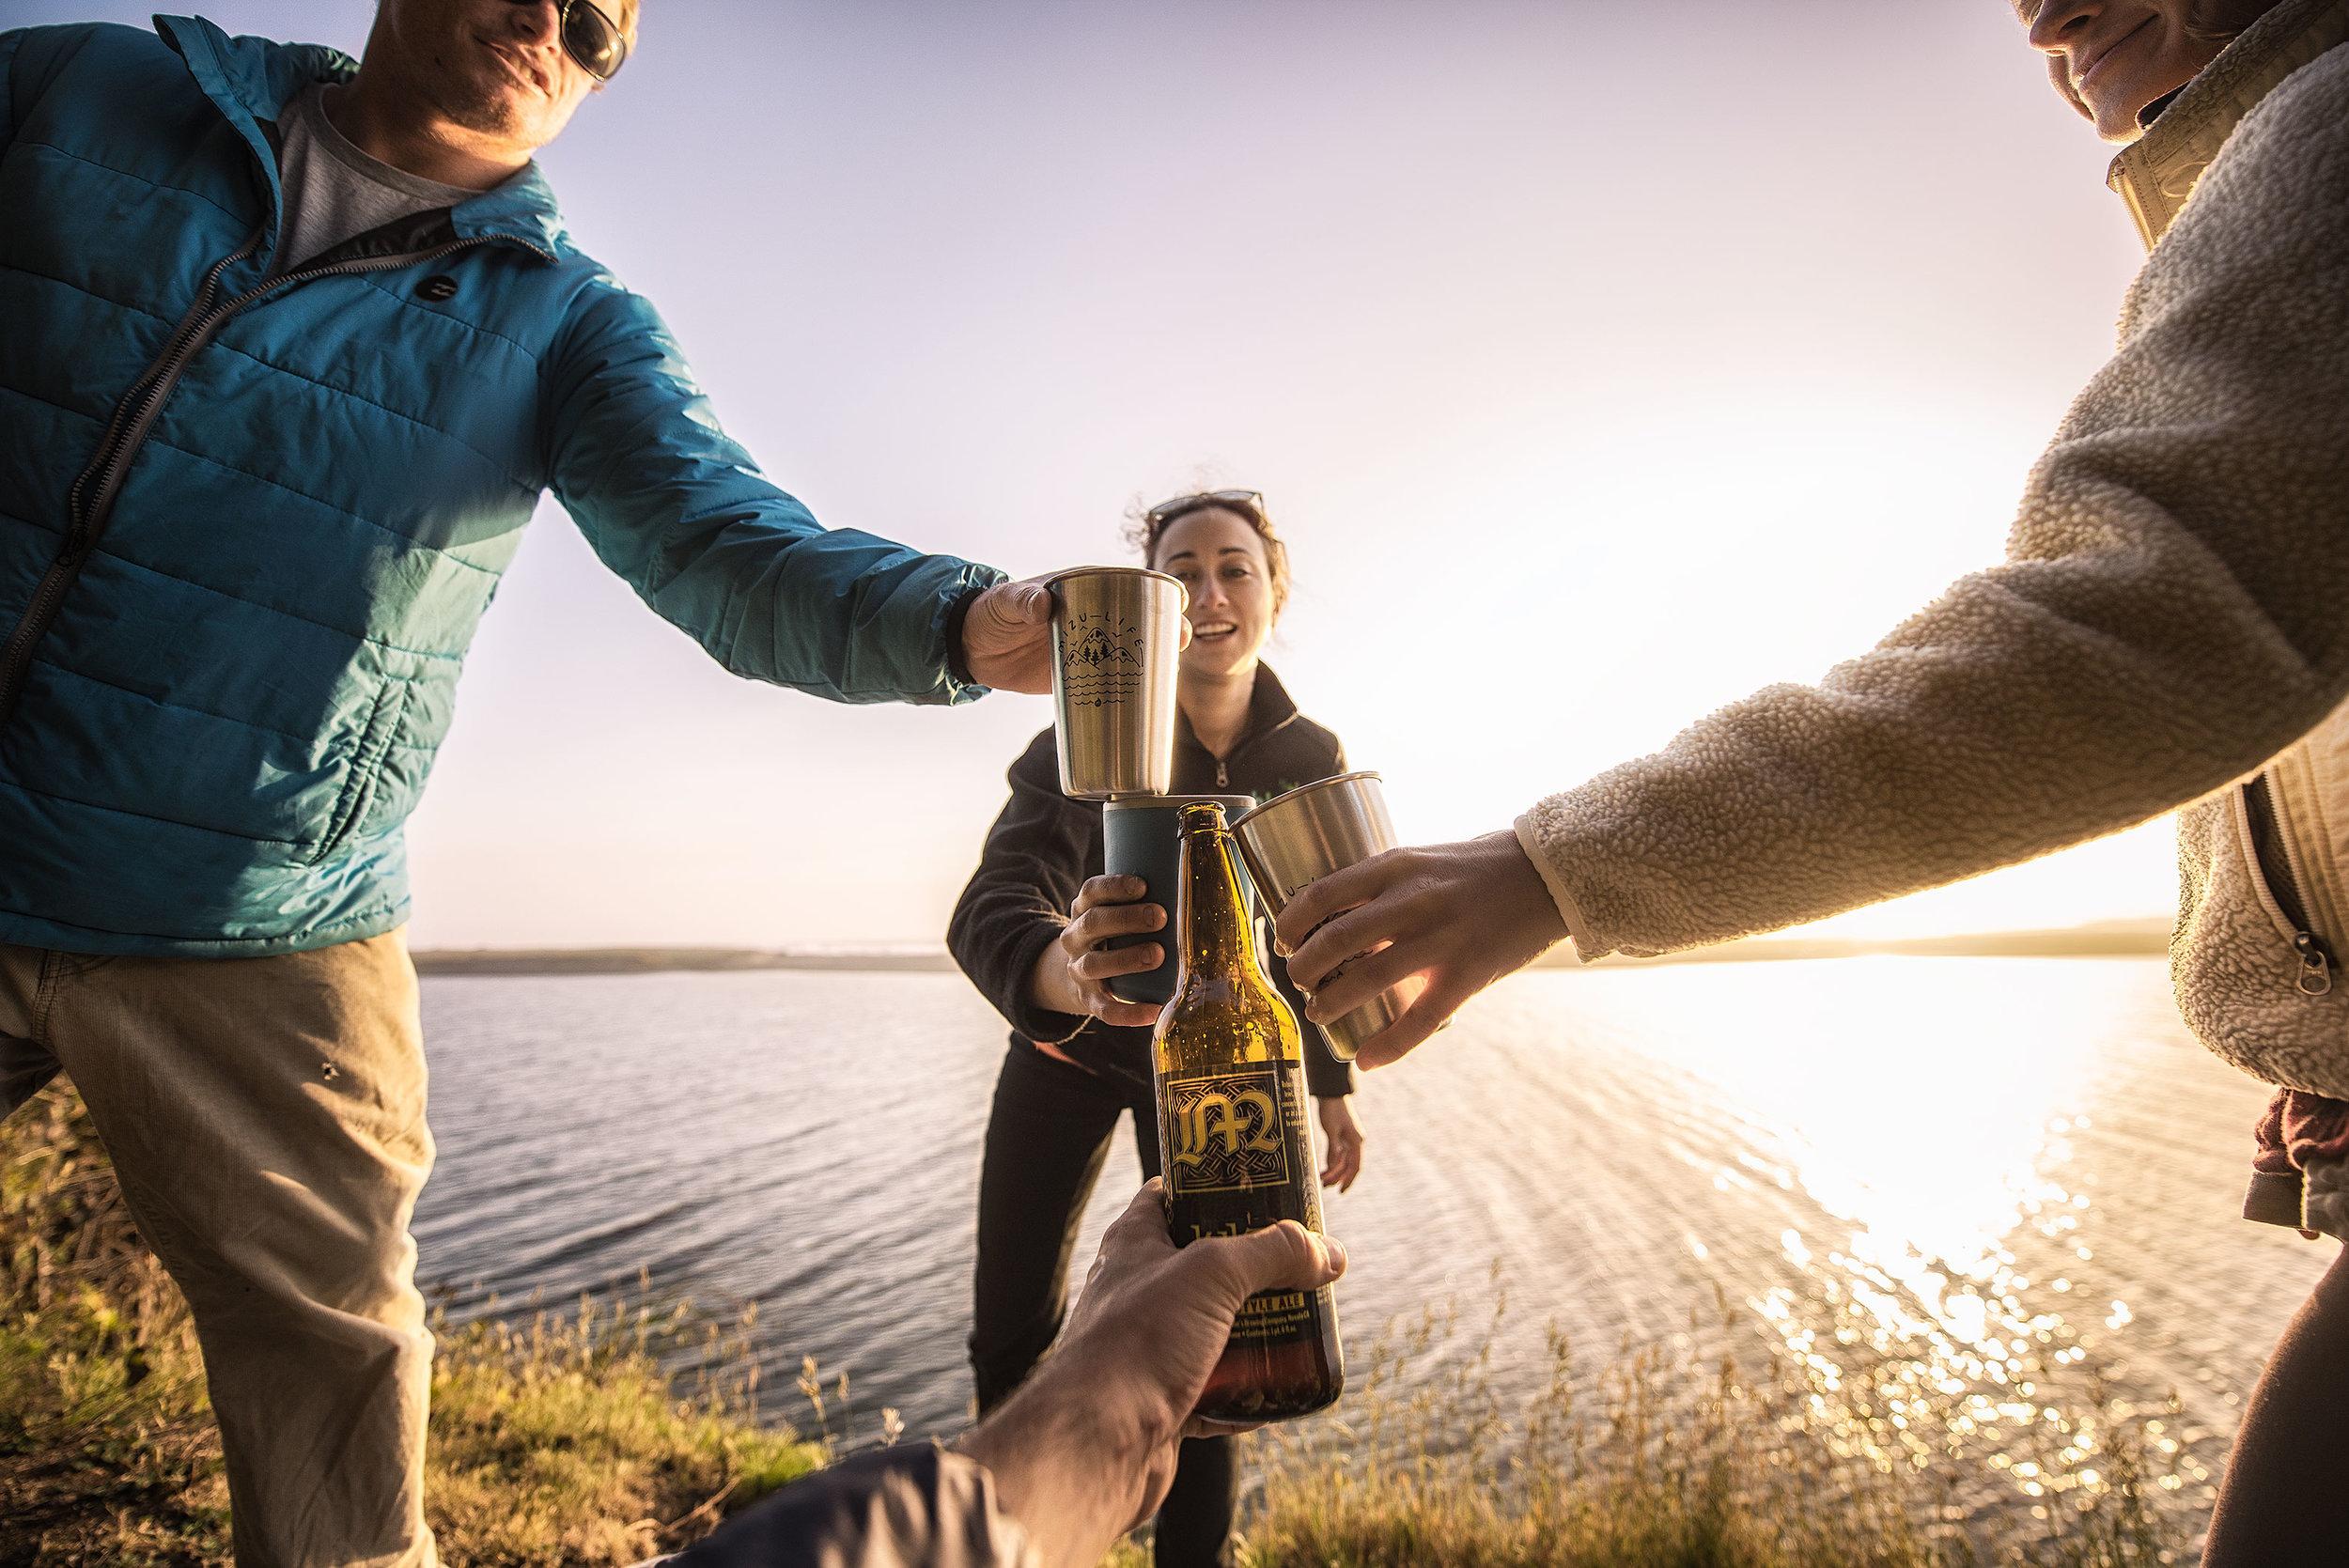 austin-trigg-redwood-water-bottle-Mizu-beach-beer-cheers-drinking-ocean-california-sunset-camping.jpg